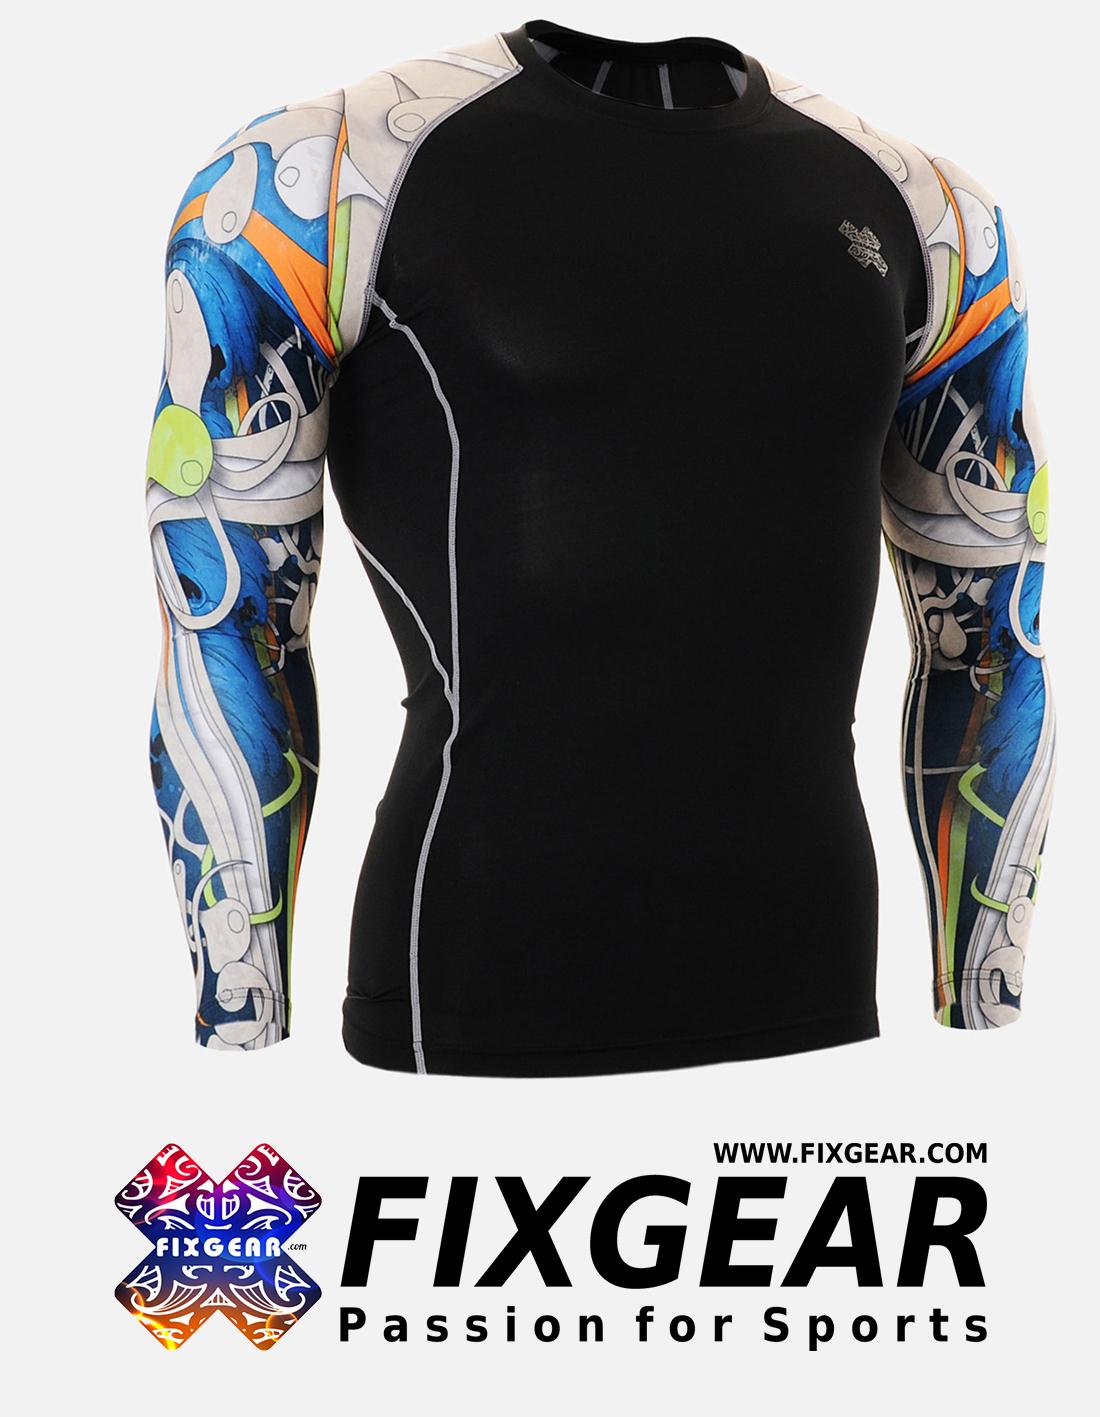 FIXGEAR CPD-B19B Compression Base Layer Shirt